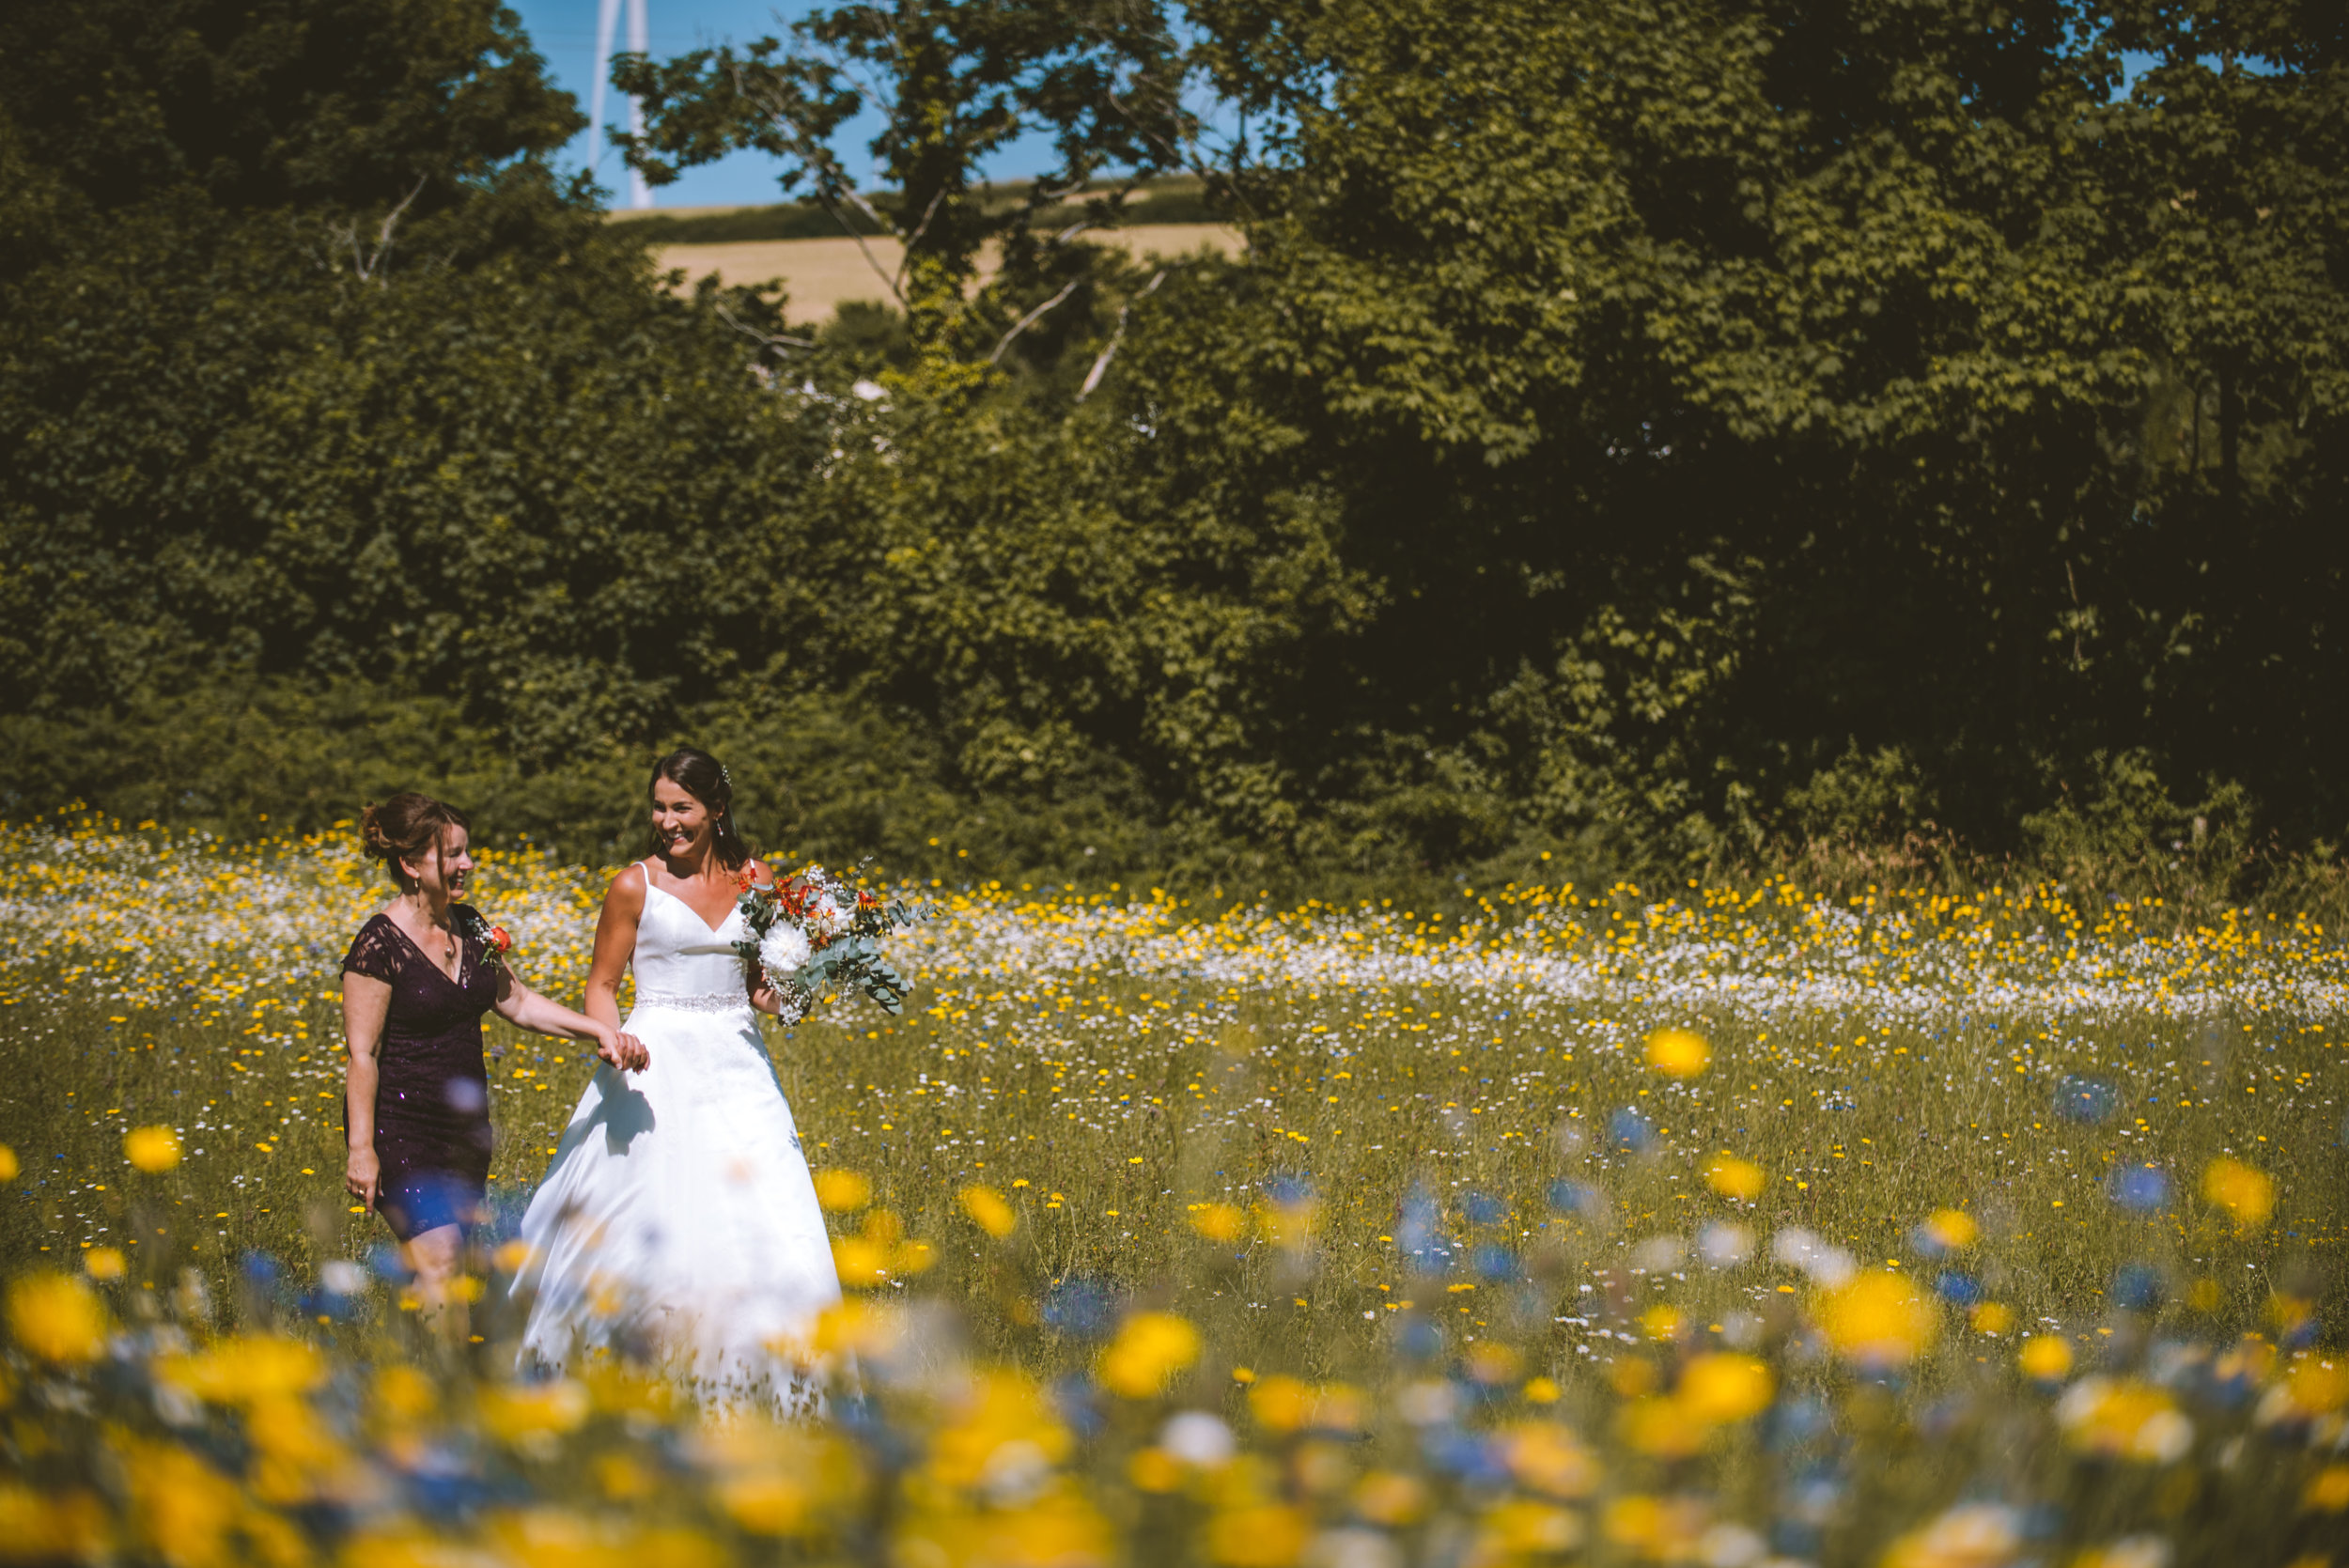 ash-barton-estate-wedding-photographer-mark-shaw-22.jpg